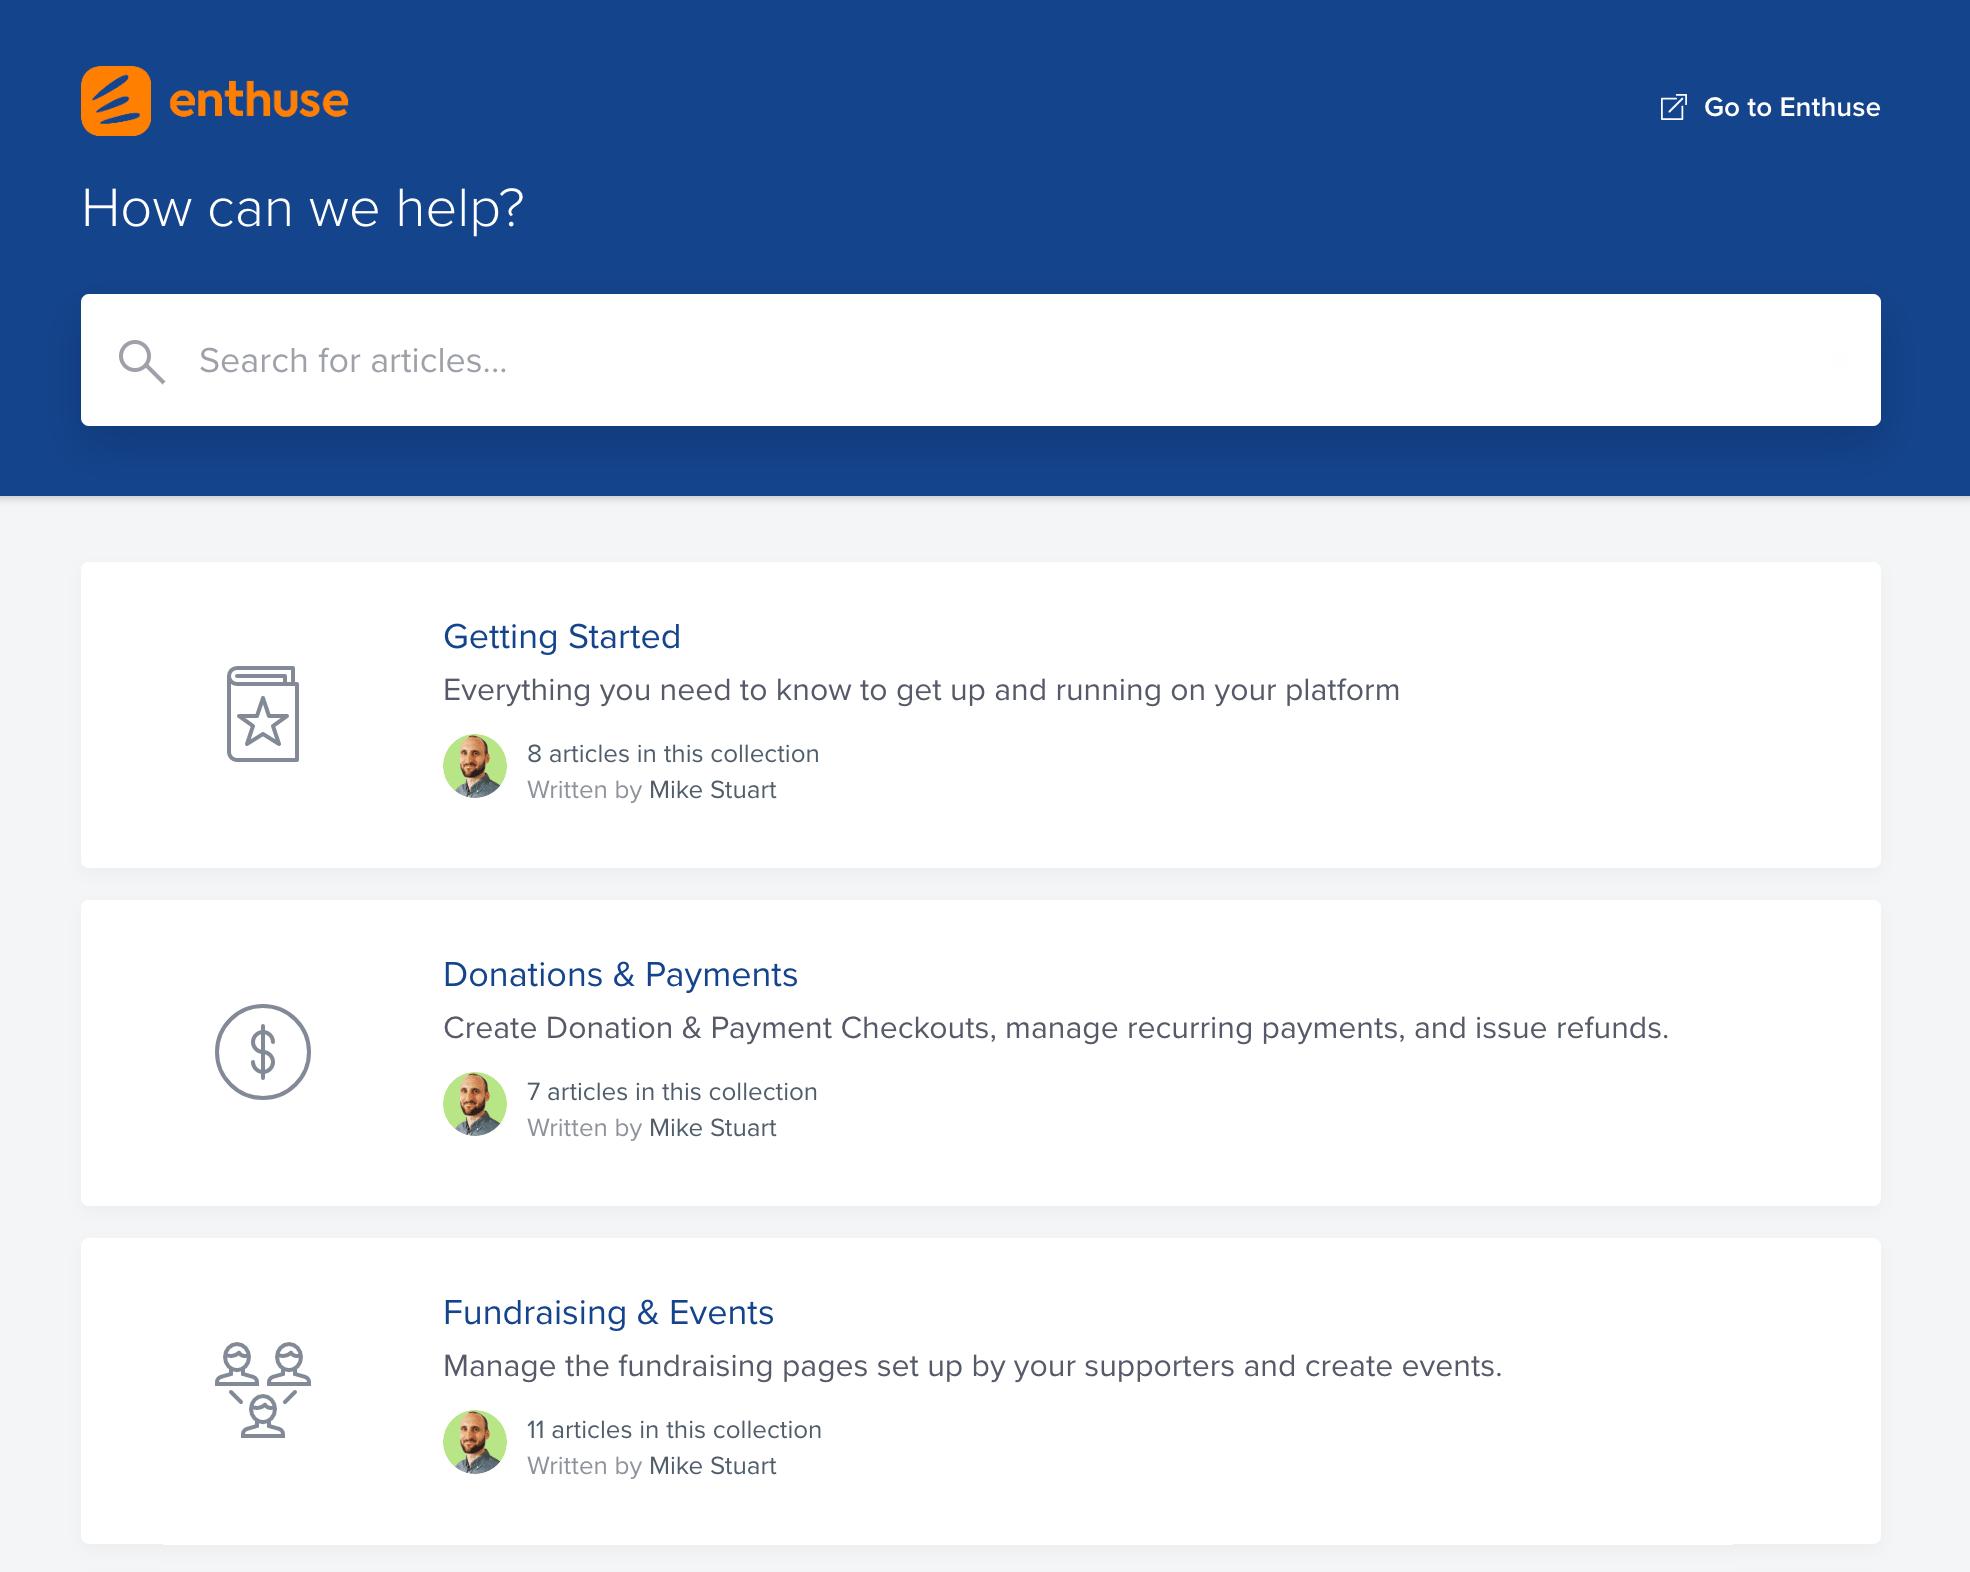 Enthuse intercom screenshot - 24/7 knowledge base